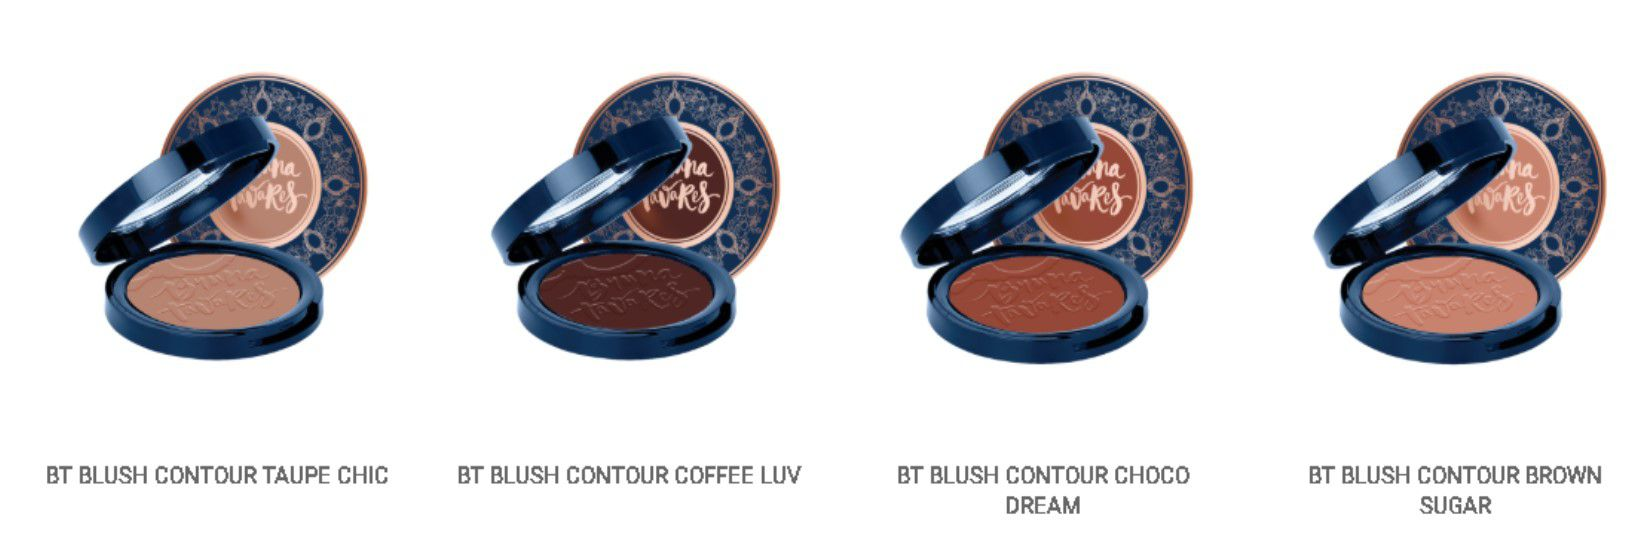 BT Blush Contour | Bruna Tavares